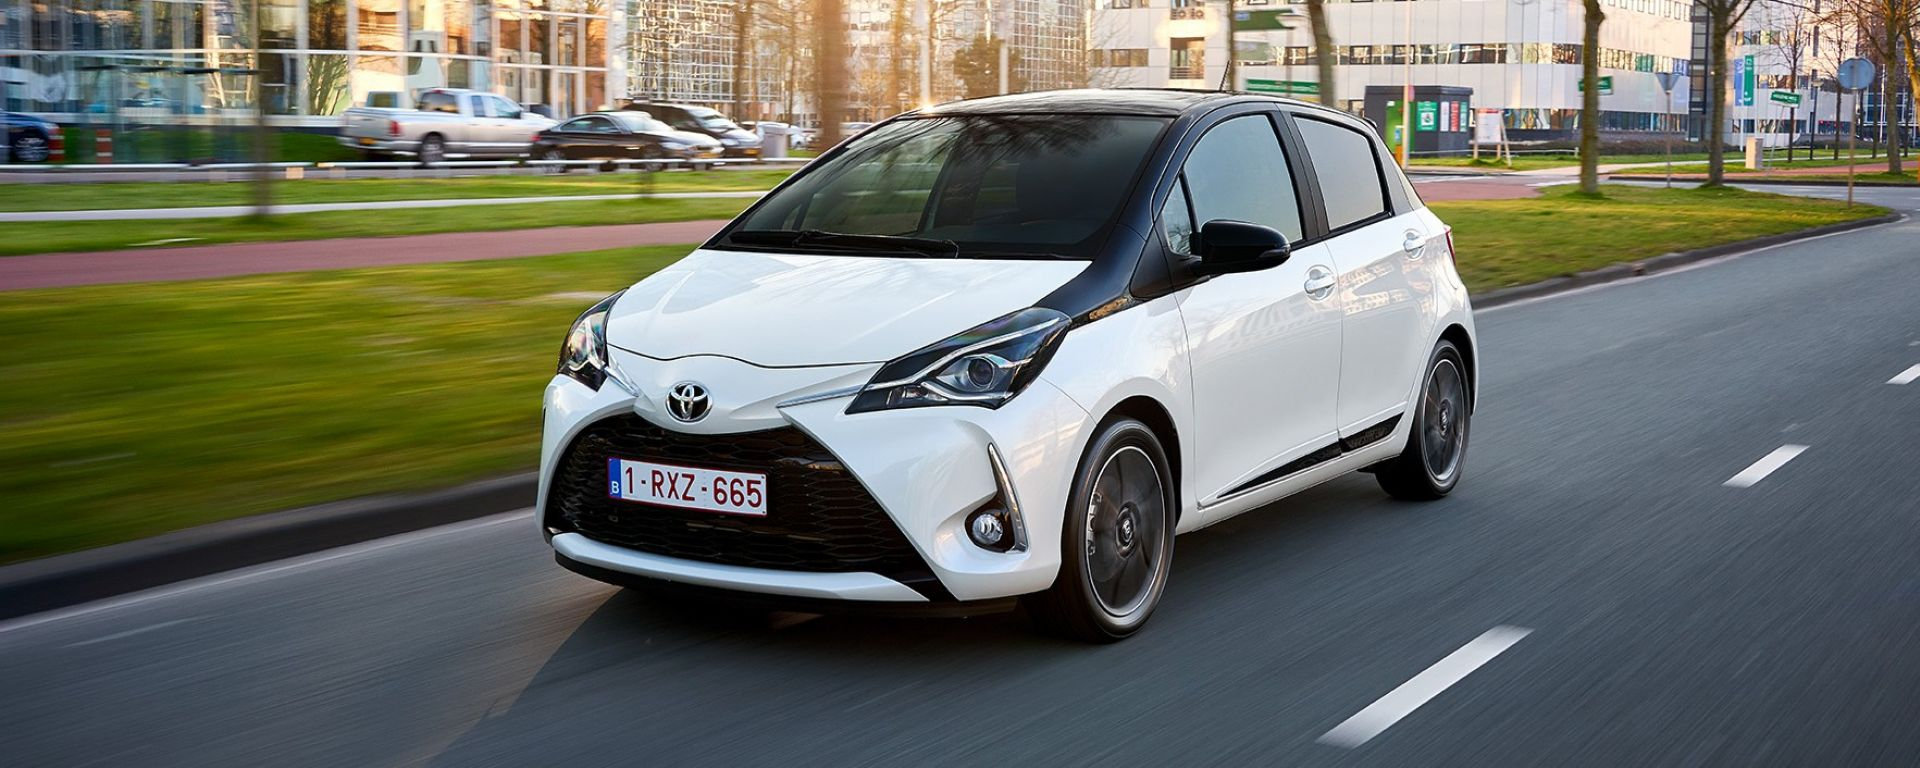 Toyota Yaris 2017: prova, dotazioni, prezzi [VIDEO]